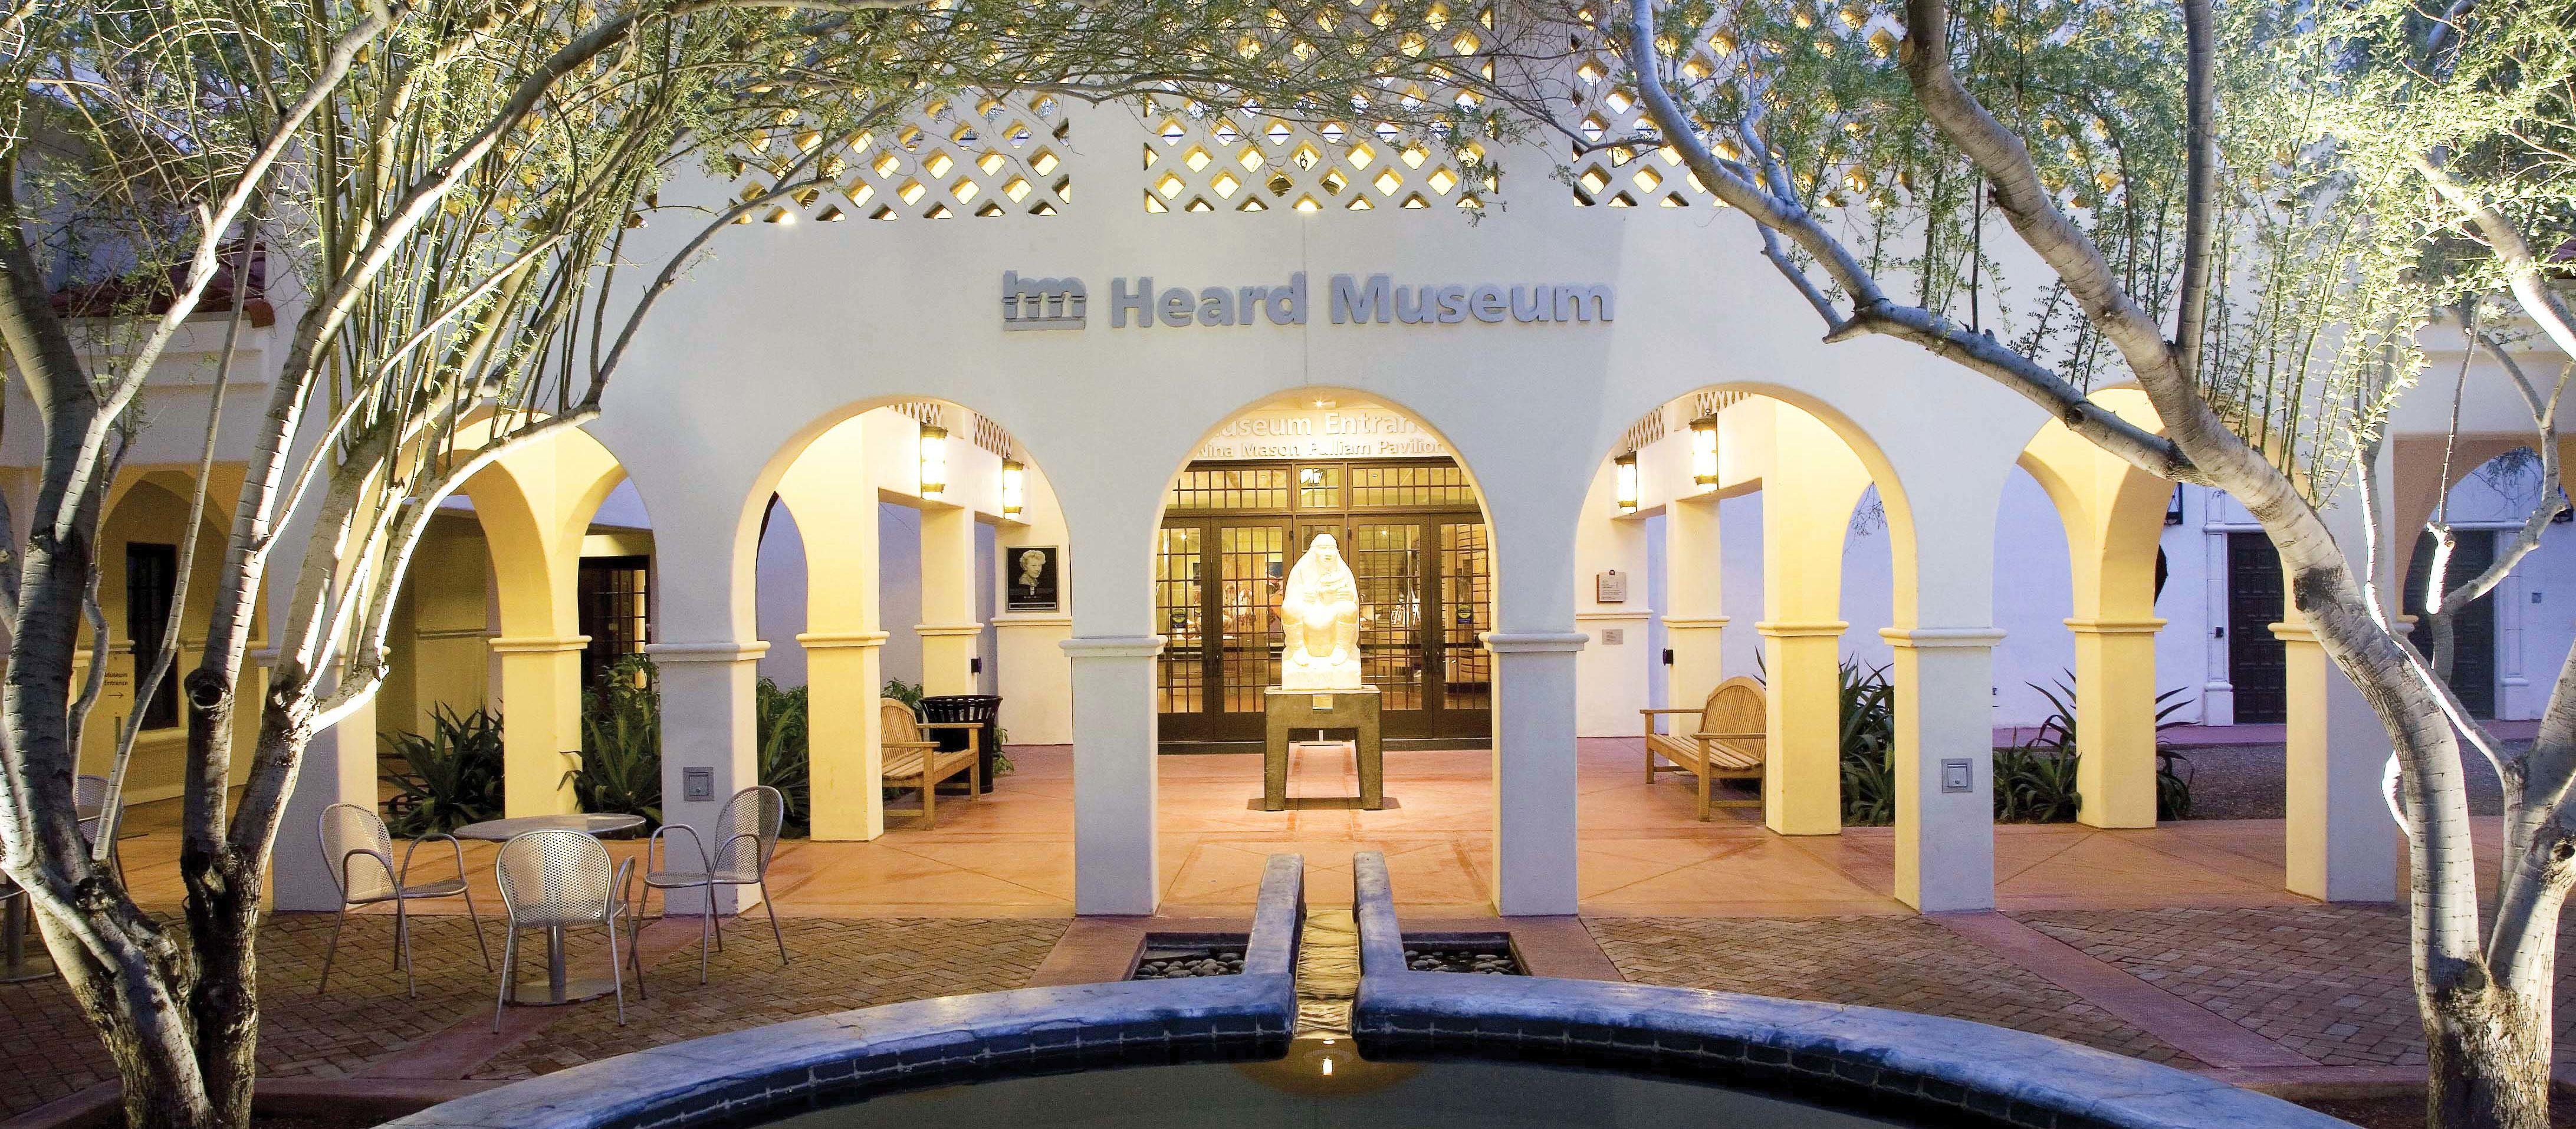 Eingang des Heard Museums in Phoenix, Arizona